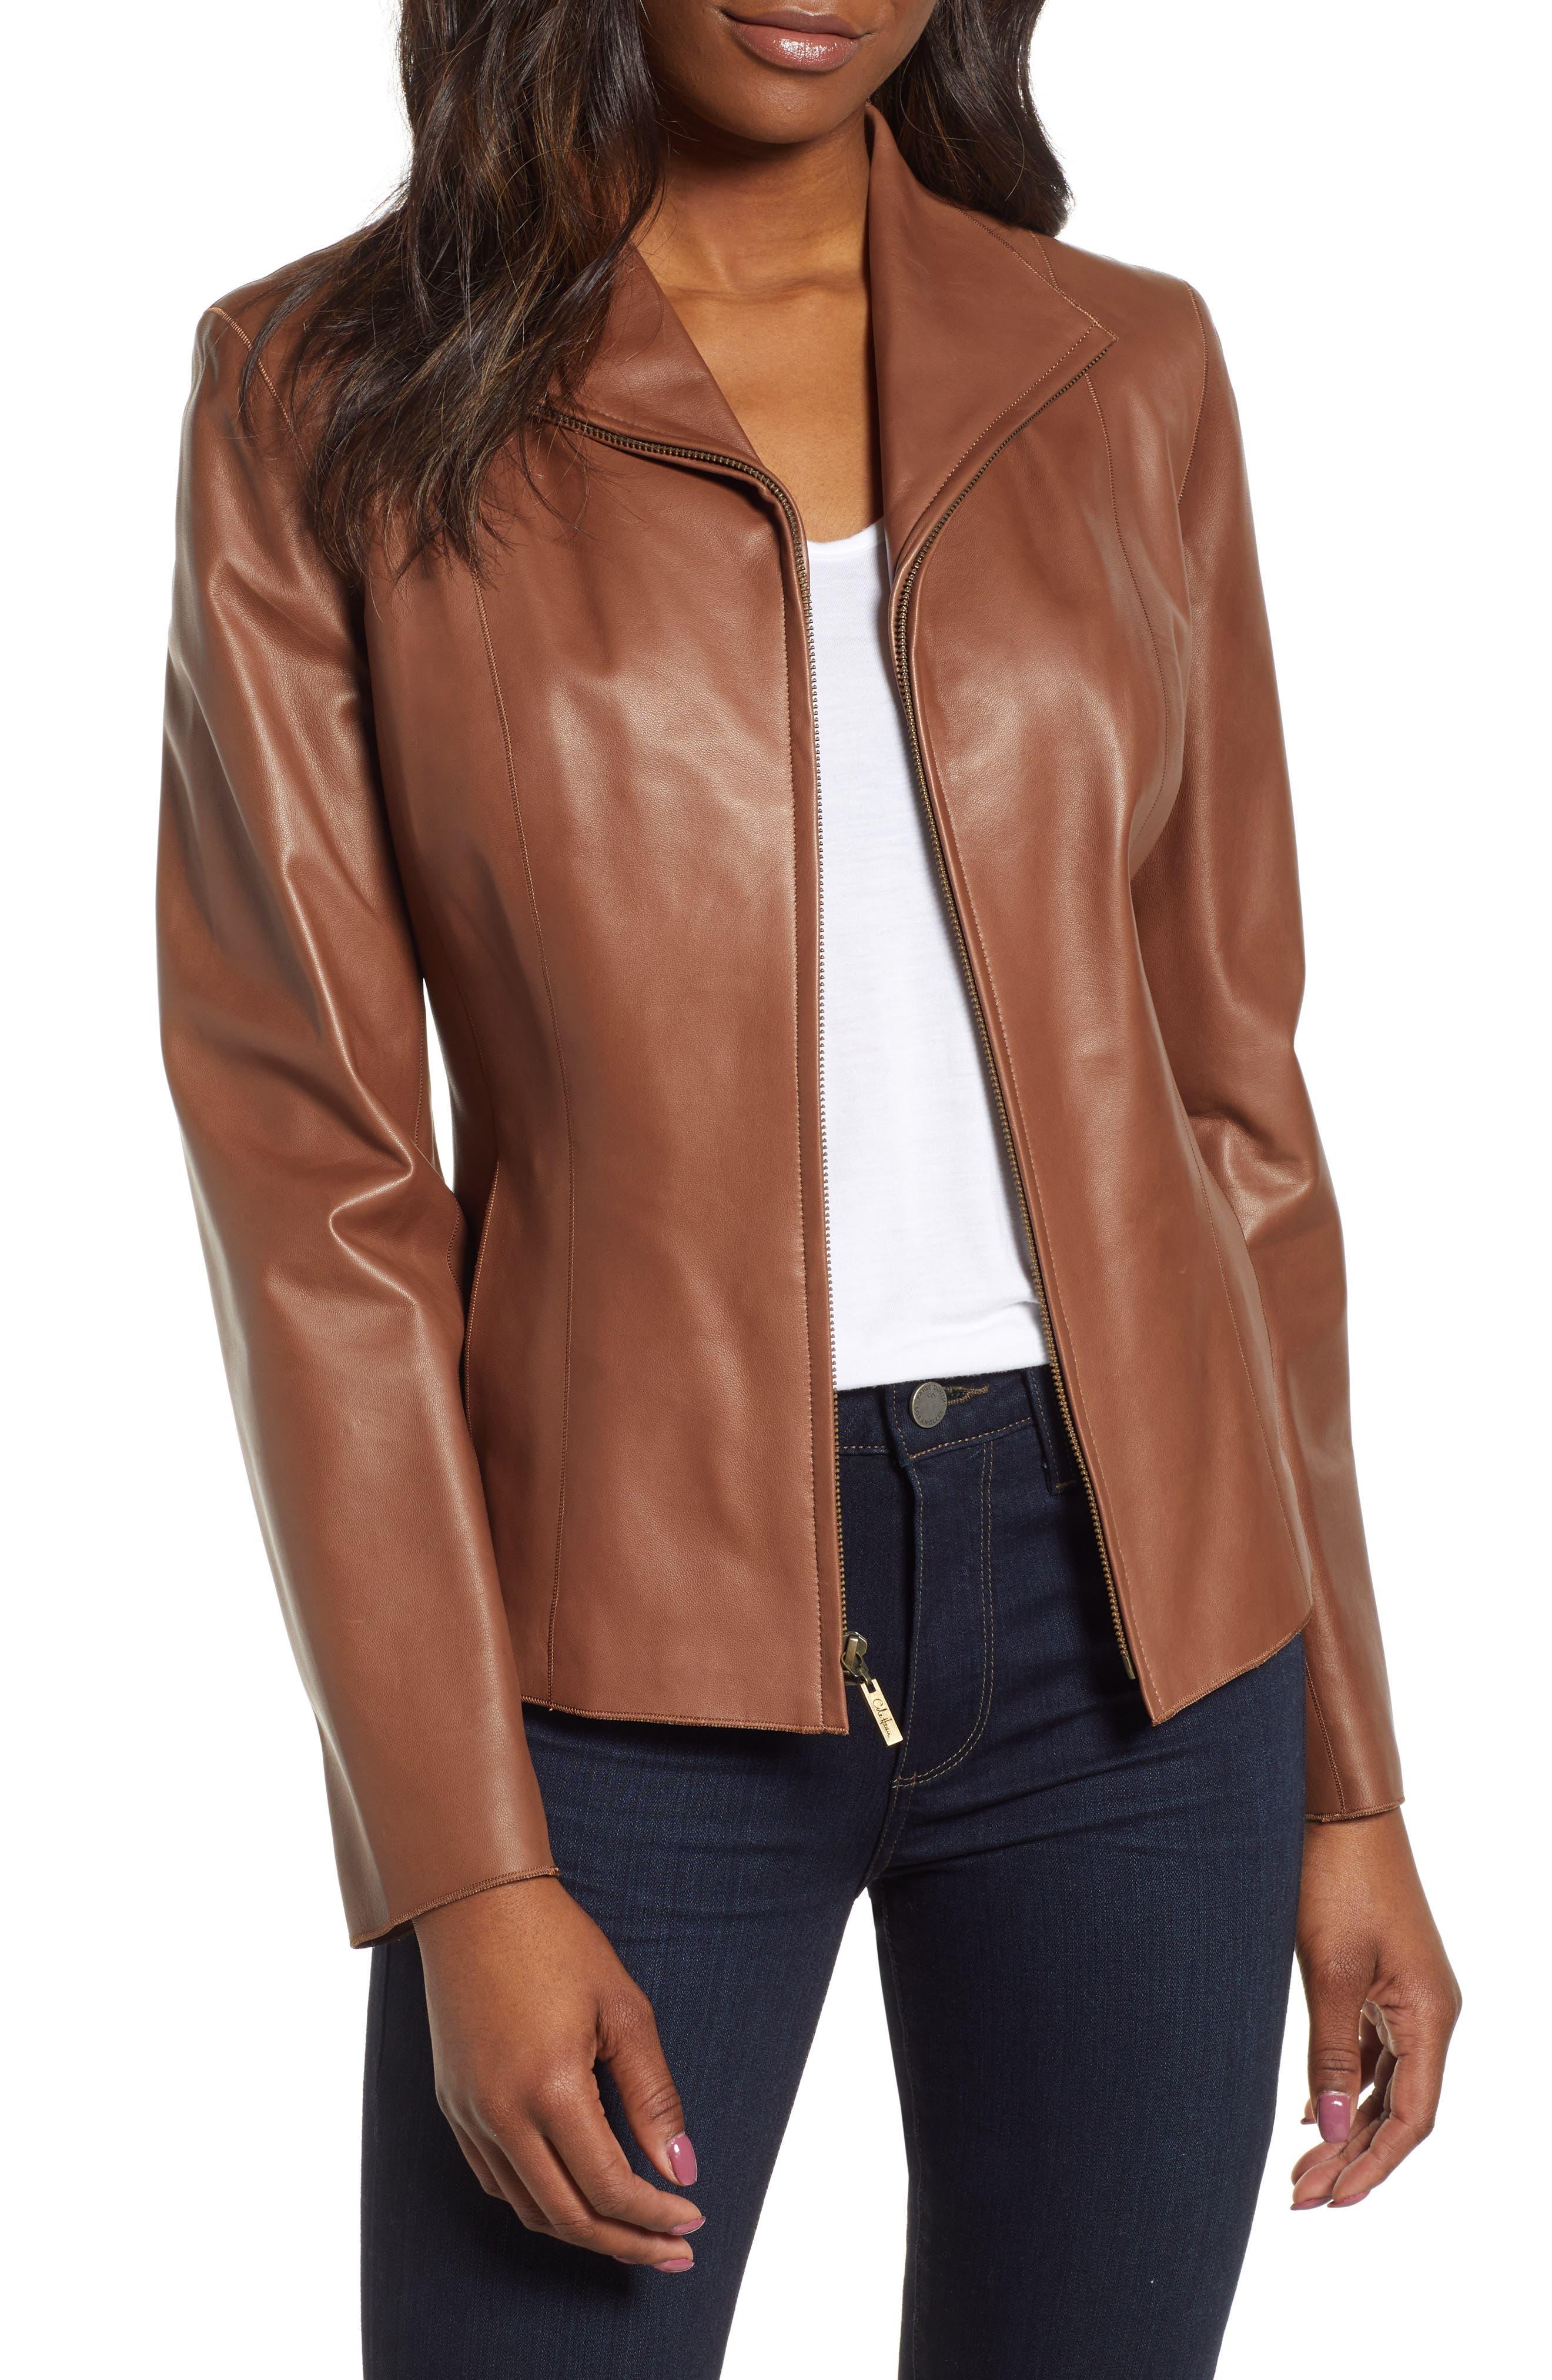 COLE HAAN,                             Lambskin Leather Scuba Jacket,                             Main thumbnail 1, color,                             237